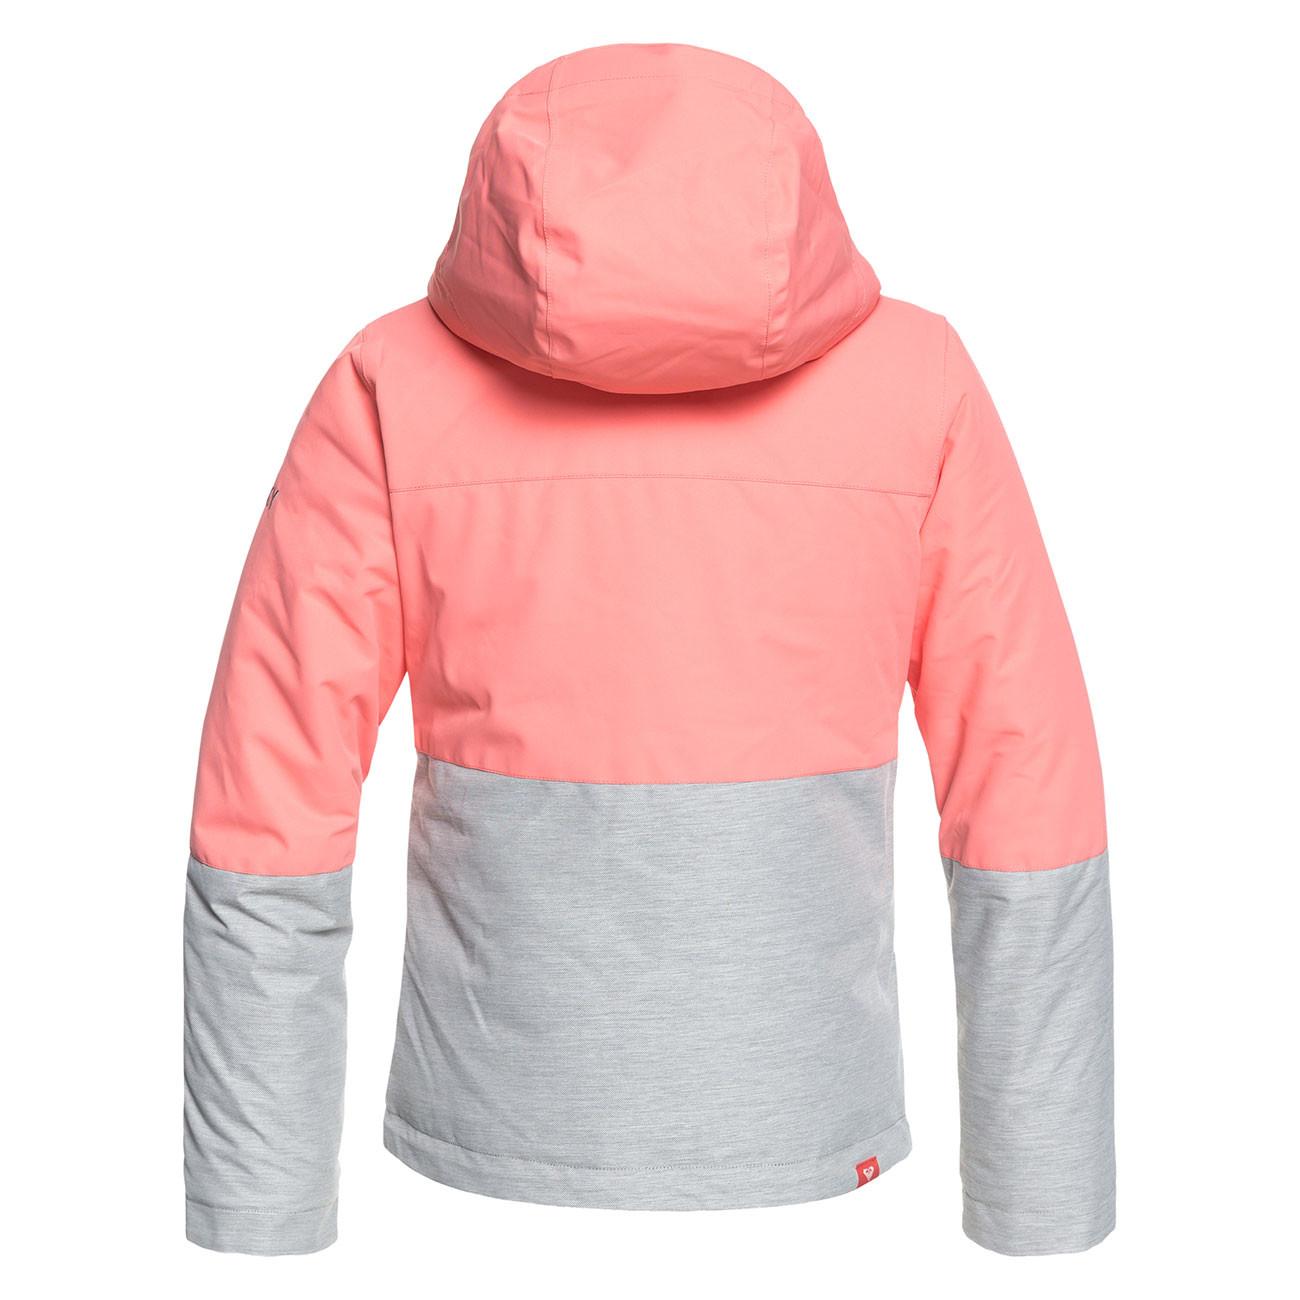 Bunda Roxy Roxy Jetty Girl Block shell pink  96a995ac474